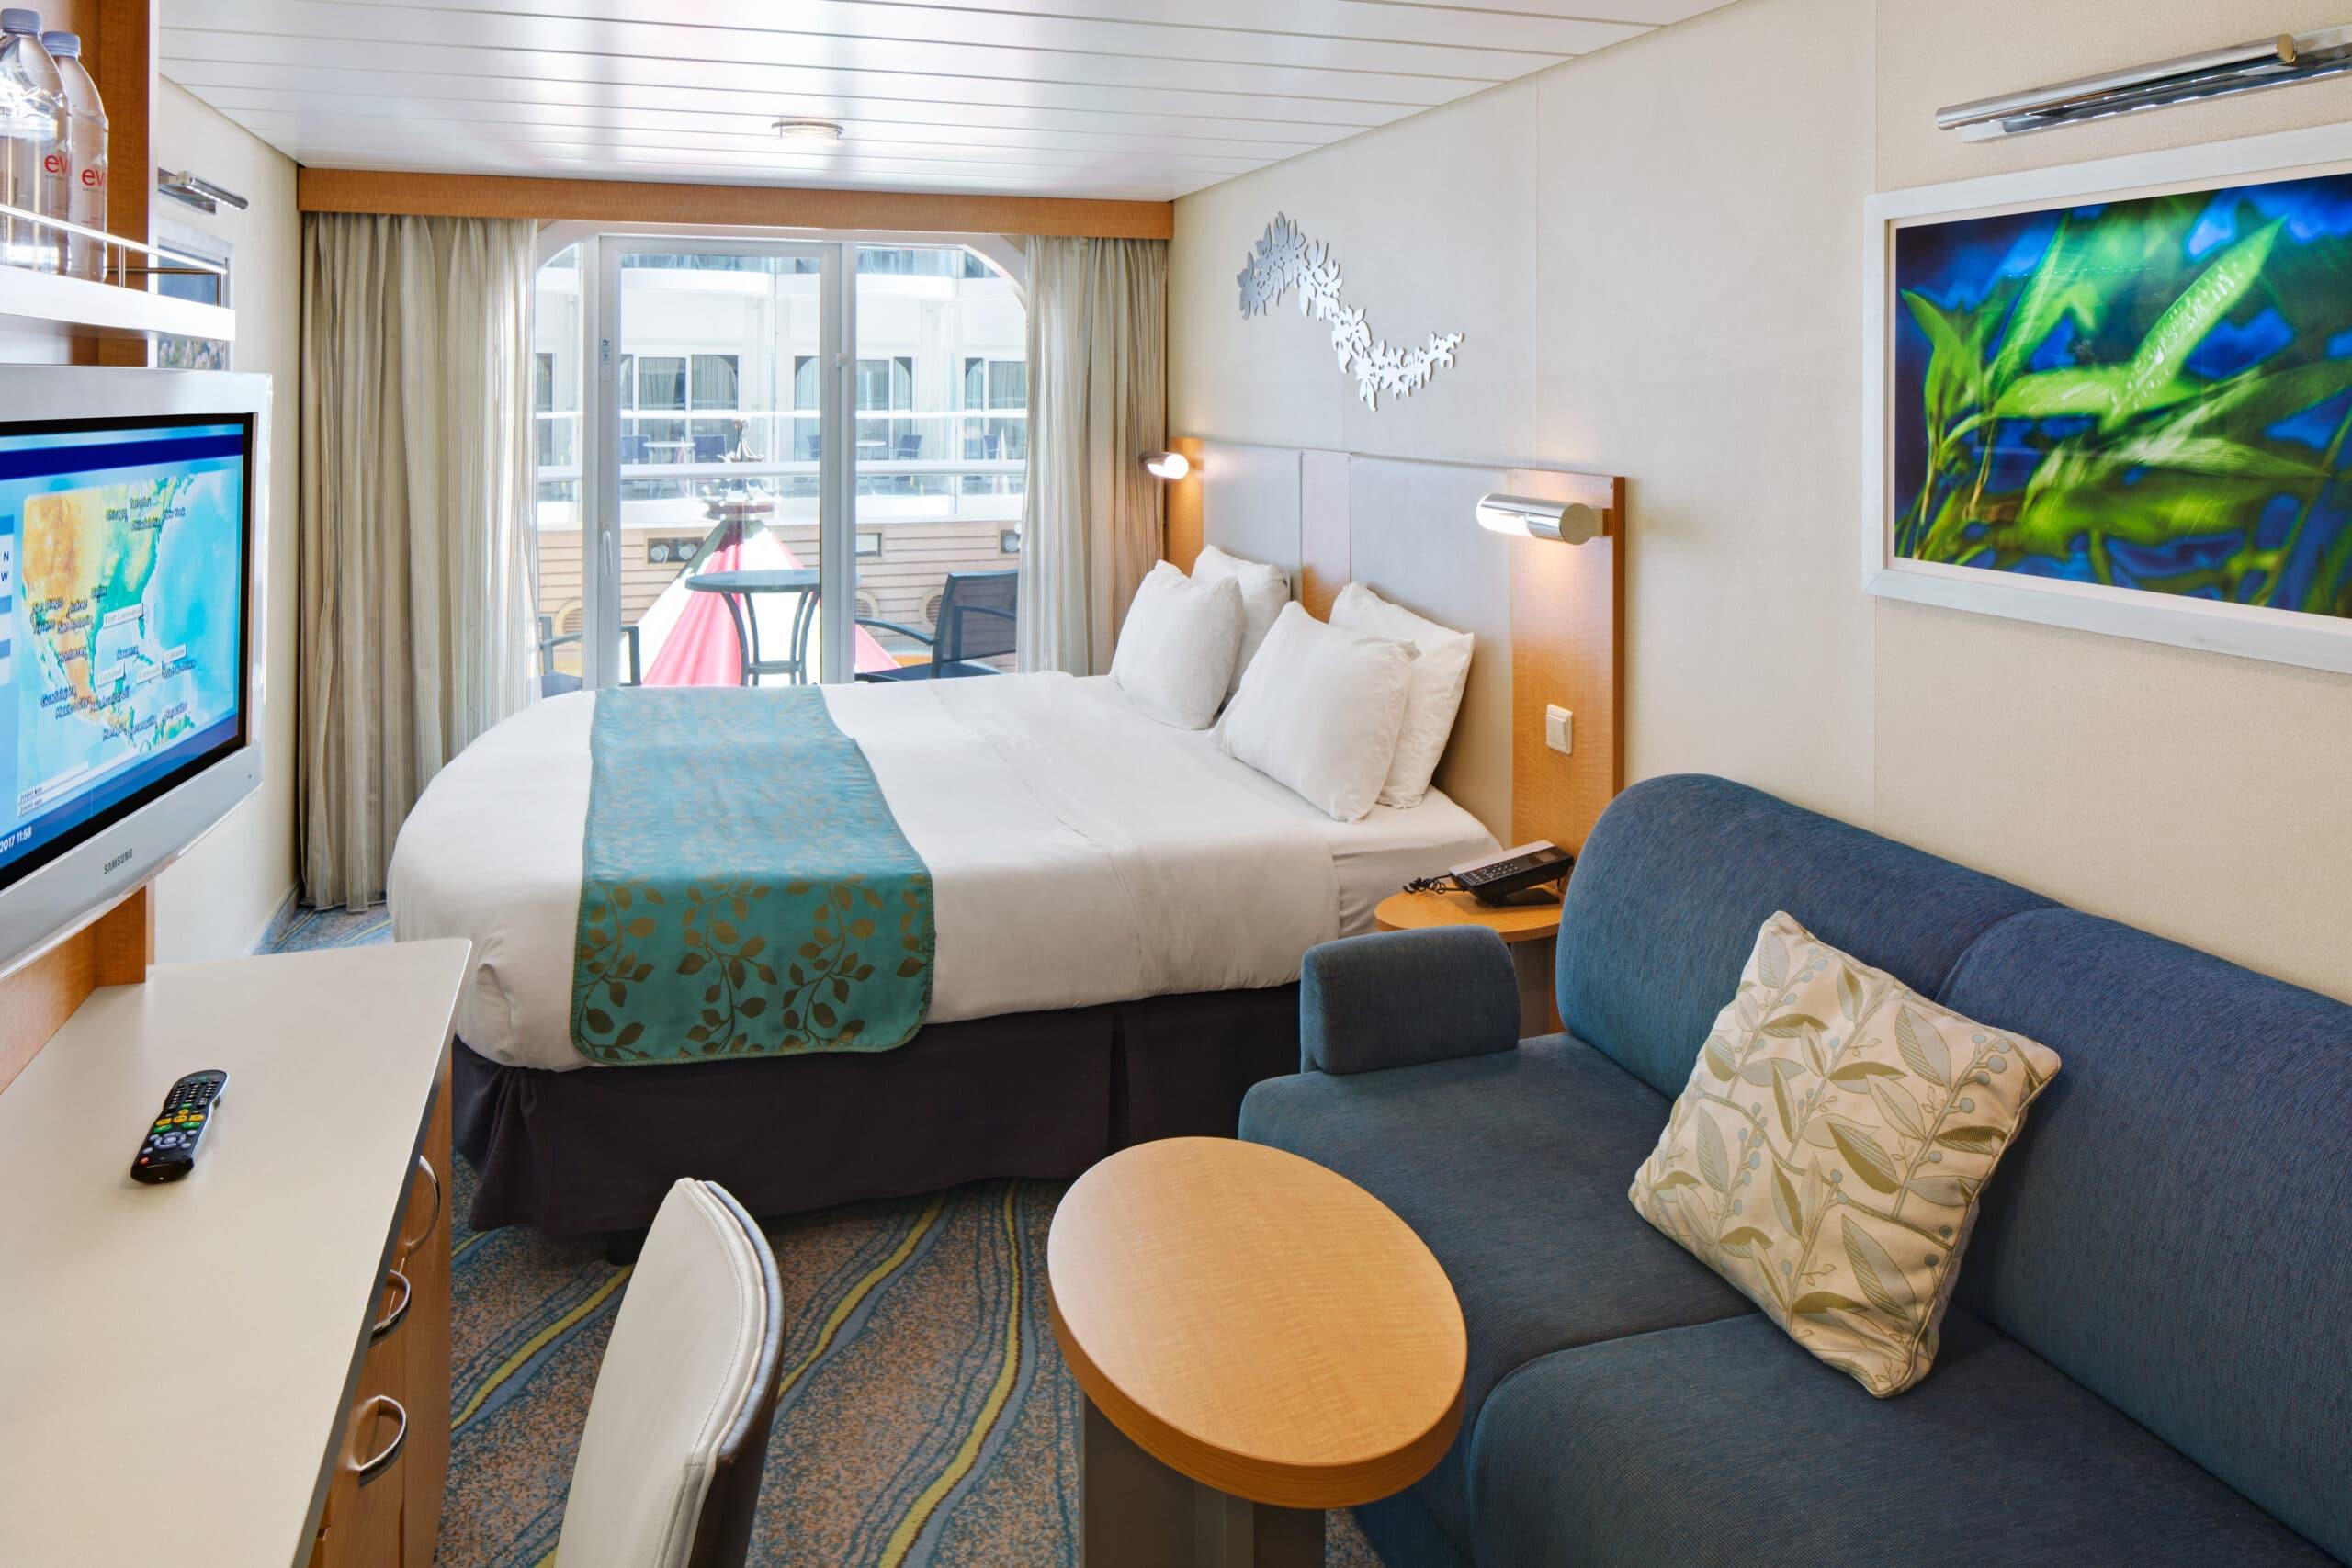 Royal-Caribbean-International-Allure-of-the-Seas-Oasis-of-the-seas-schip-cruiseschip-categorie-1L-2L-balkonhut-boardwalk